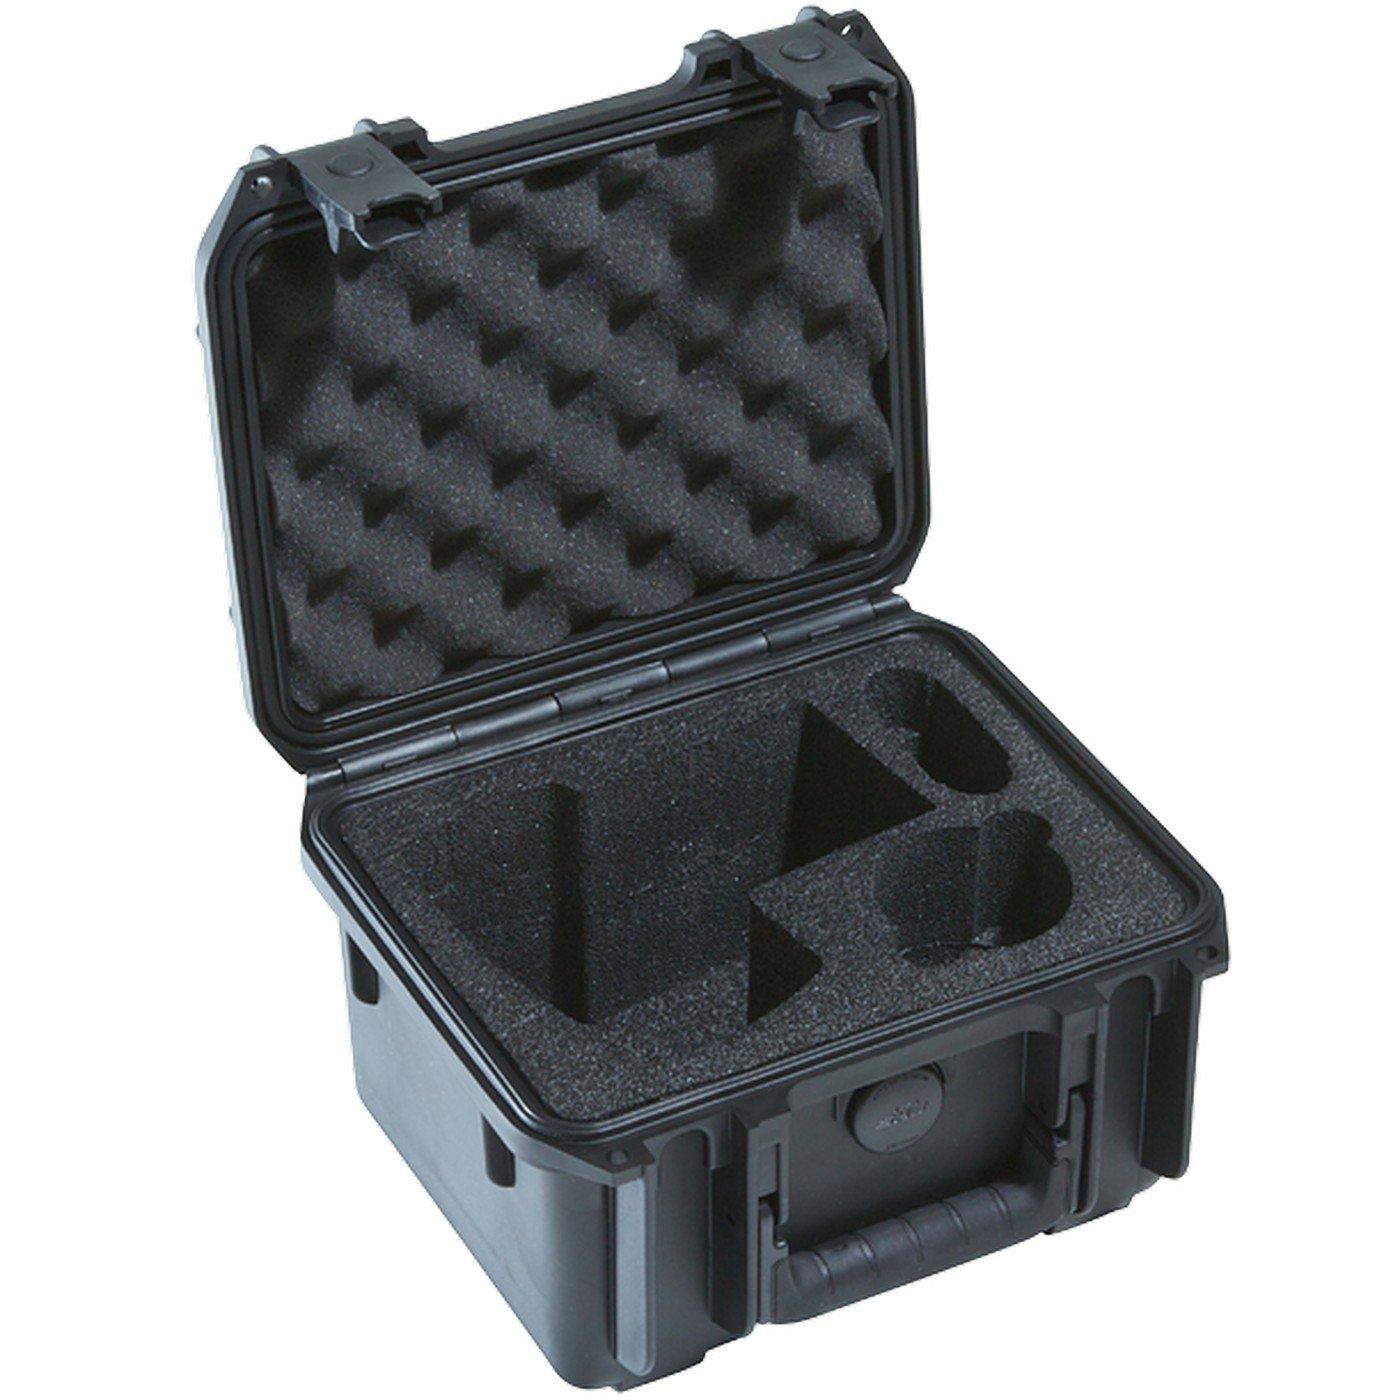 SKB 3I-0907-6SLR | iSeries Waterproof DSLR Camera Case